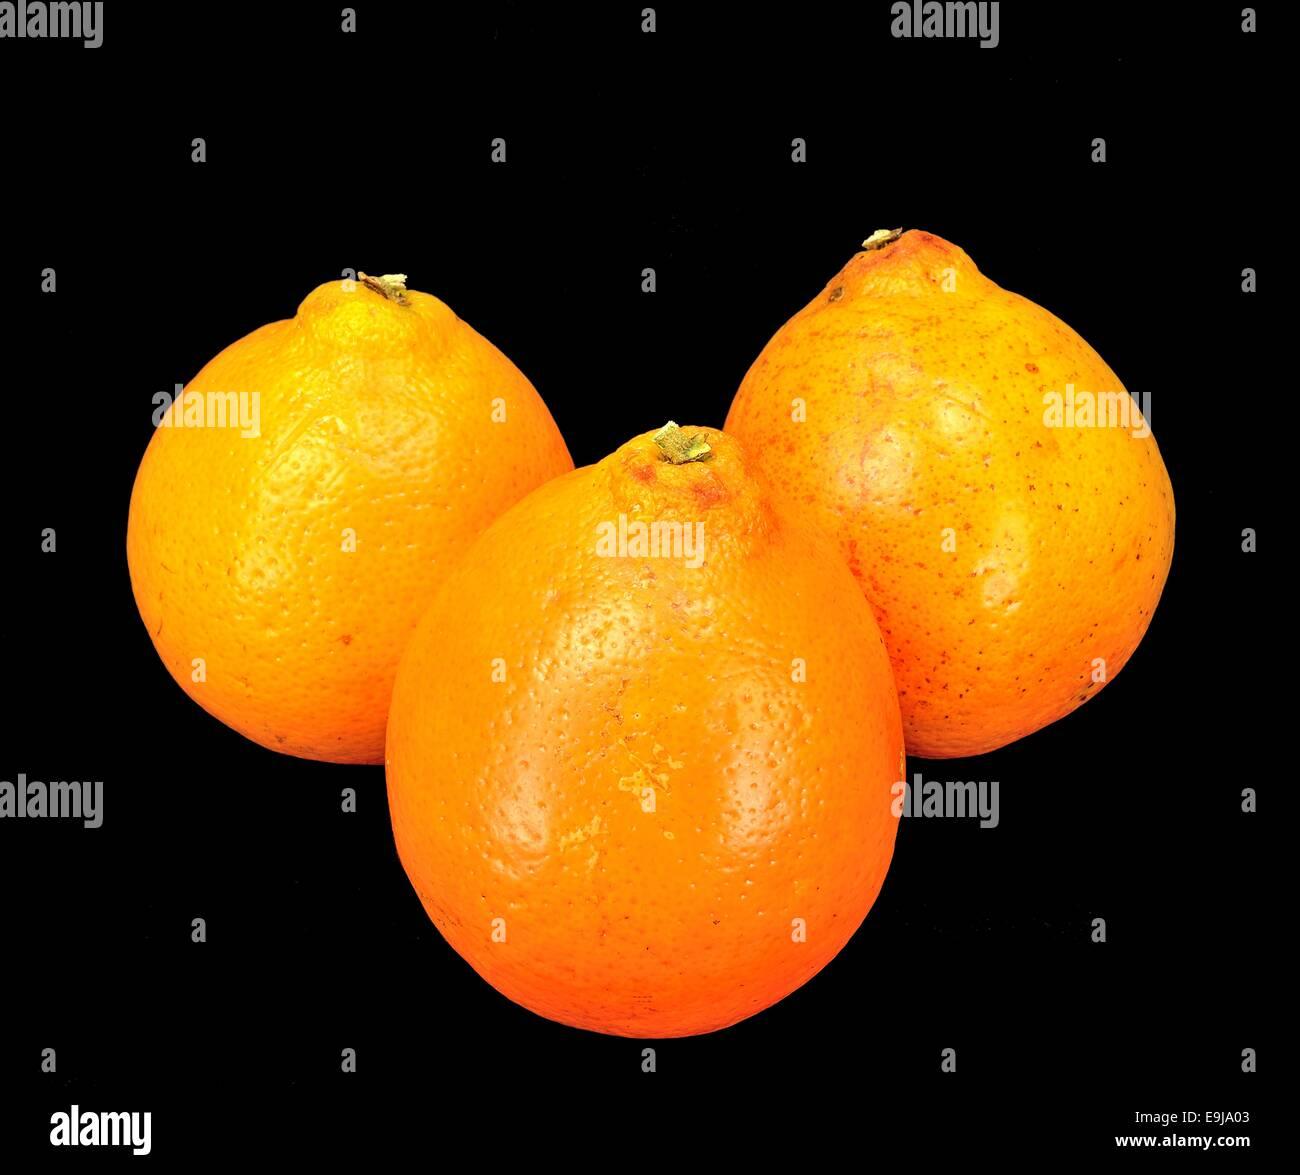 Three Mineola Tangelo (Honey Bell) oranges on a black background. - Stock Image